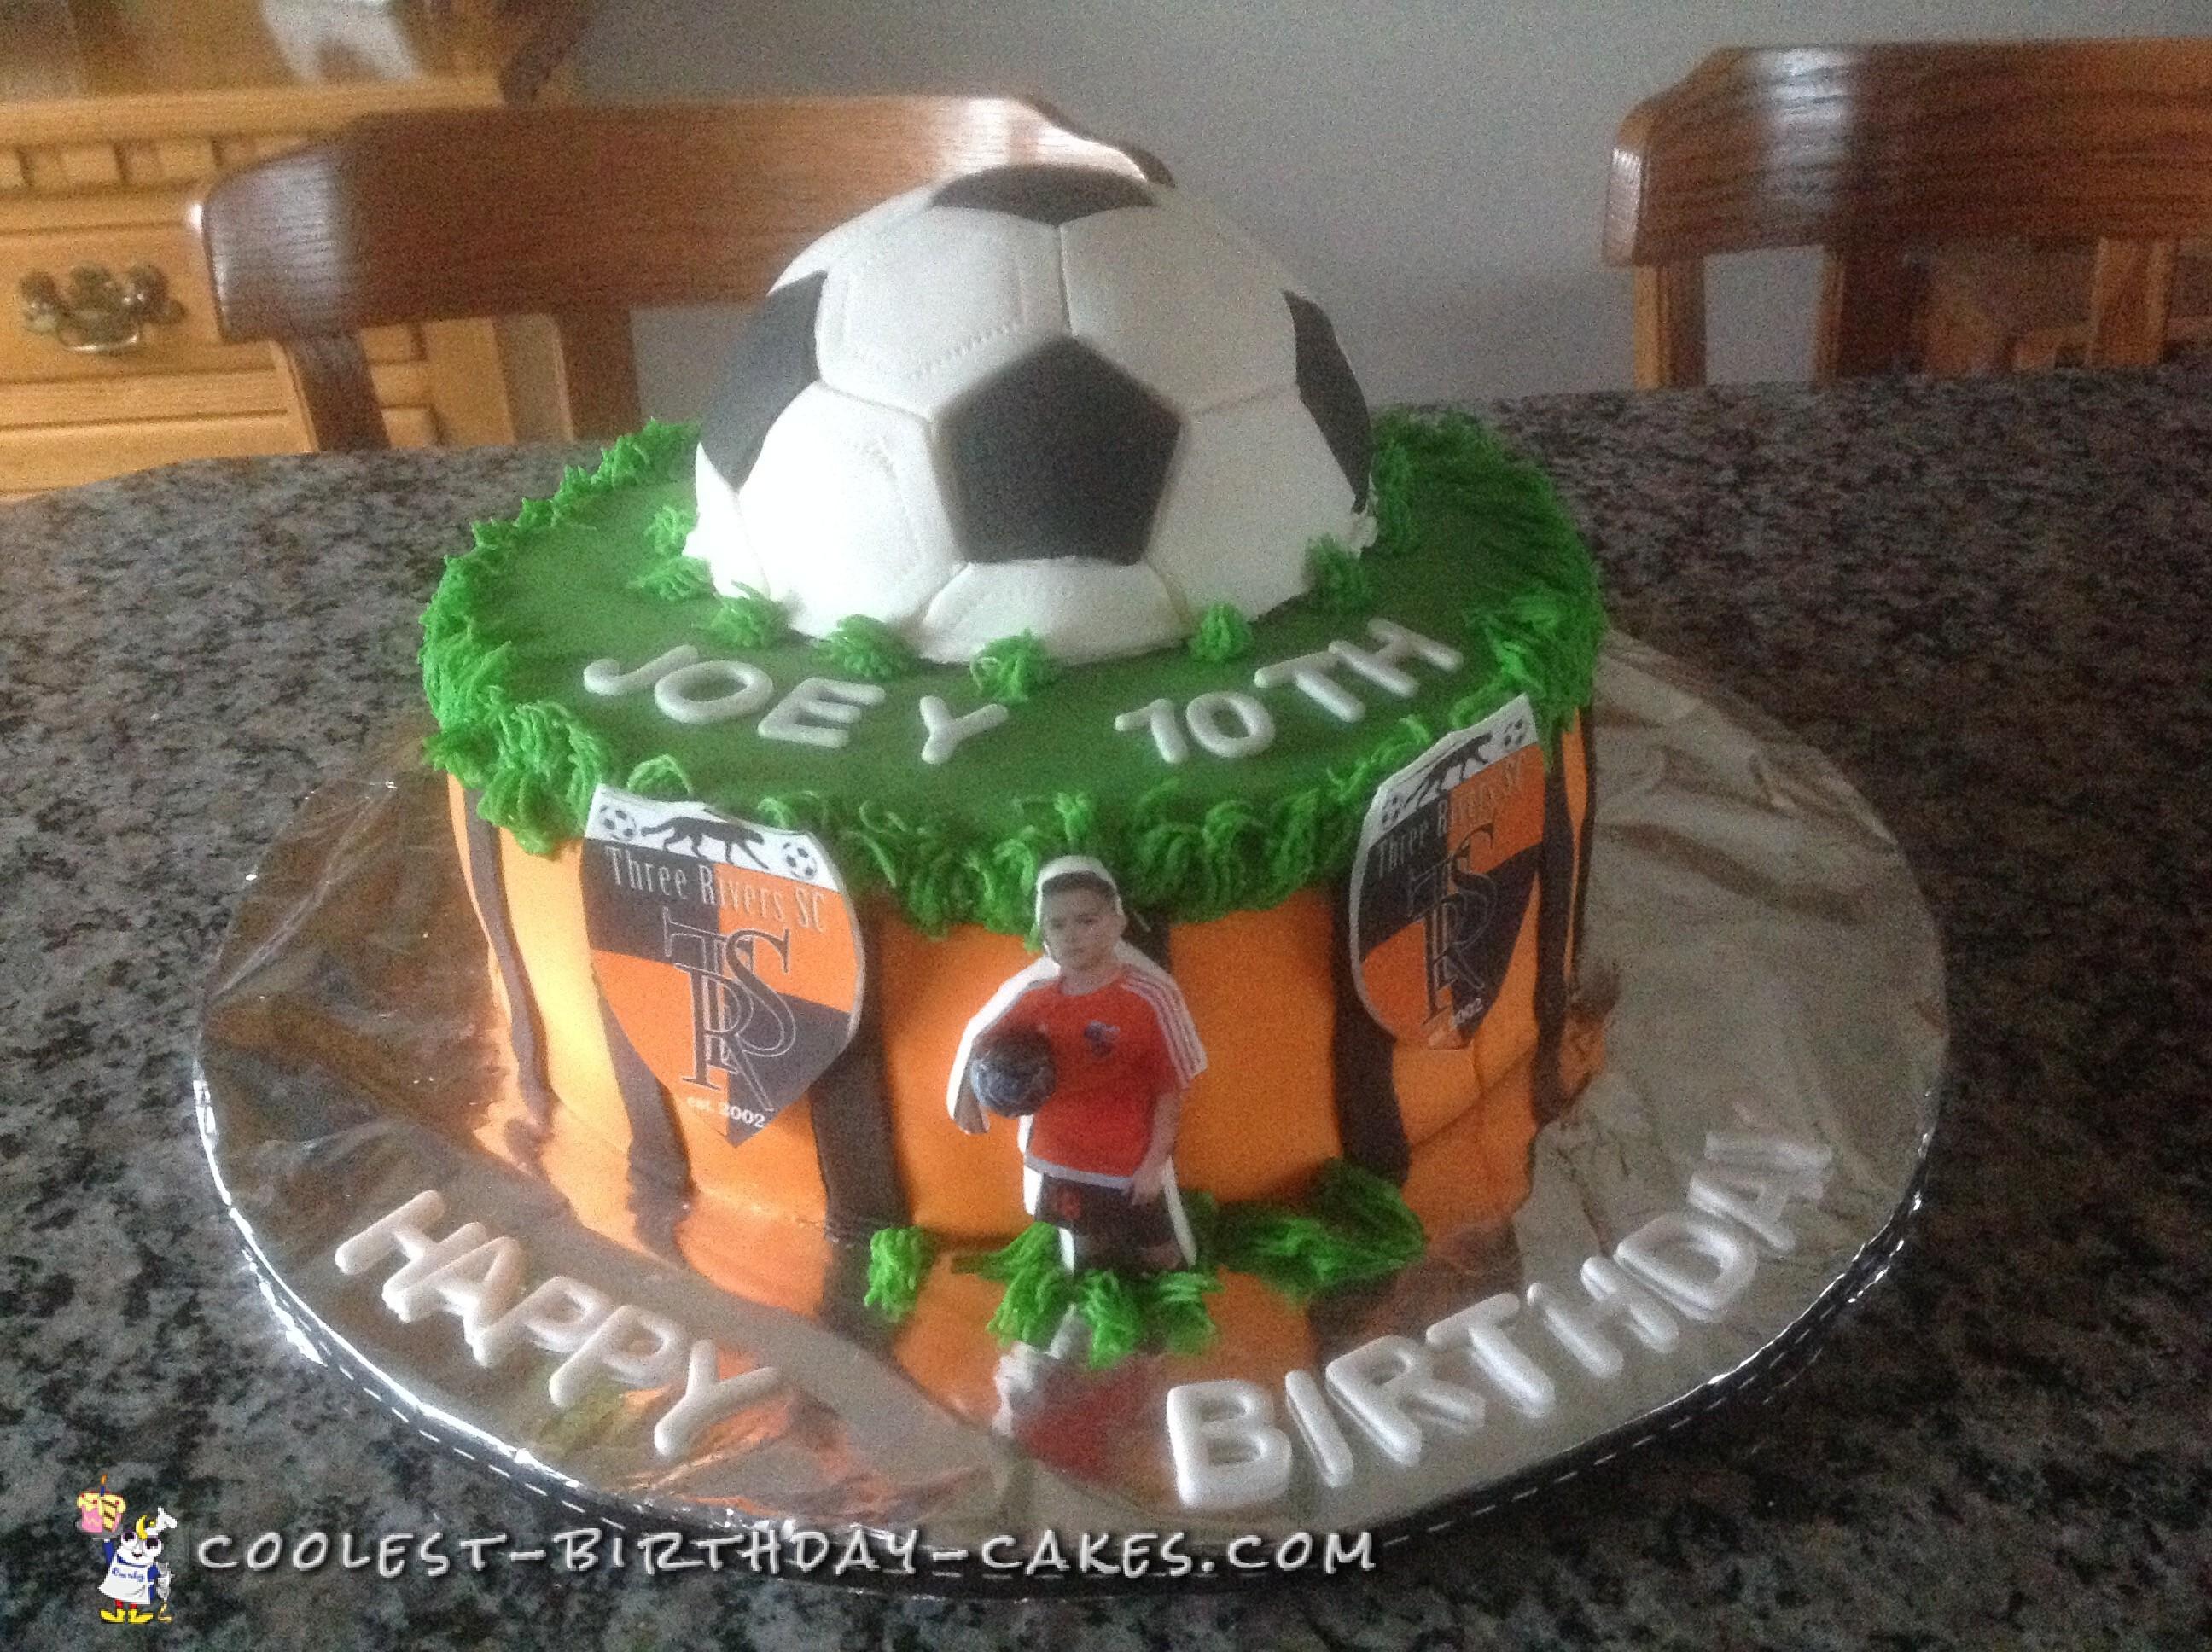 Crazy for Soccer Cake